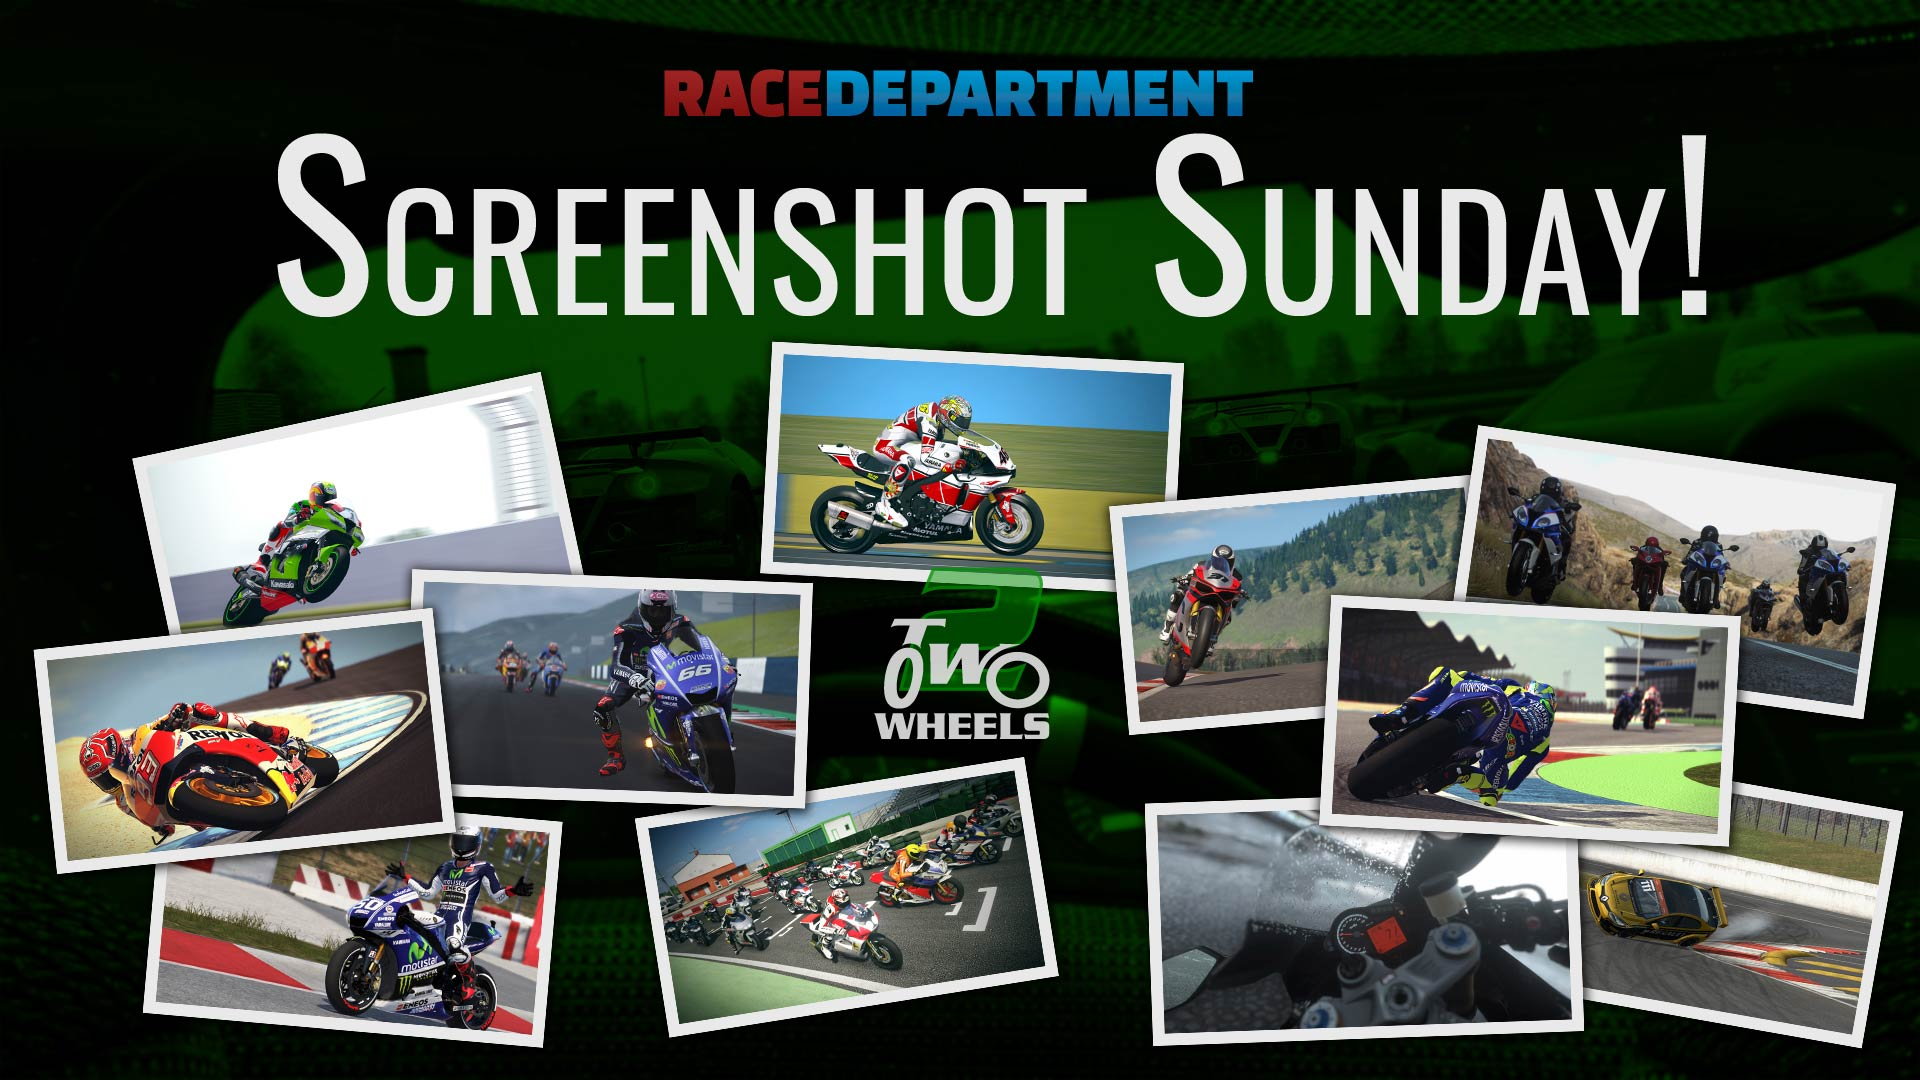 Screenshot Sunday - Two Wheels.jpg